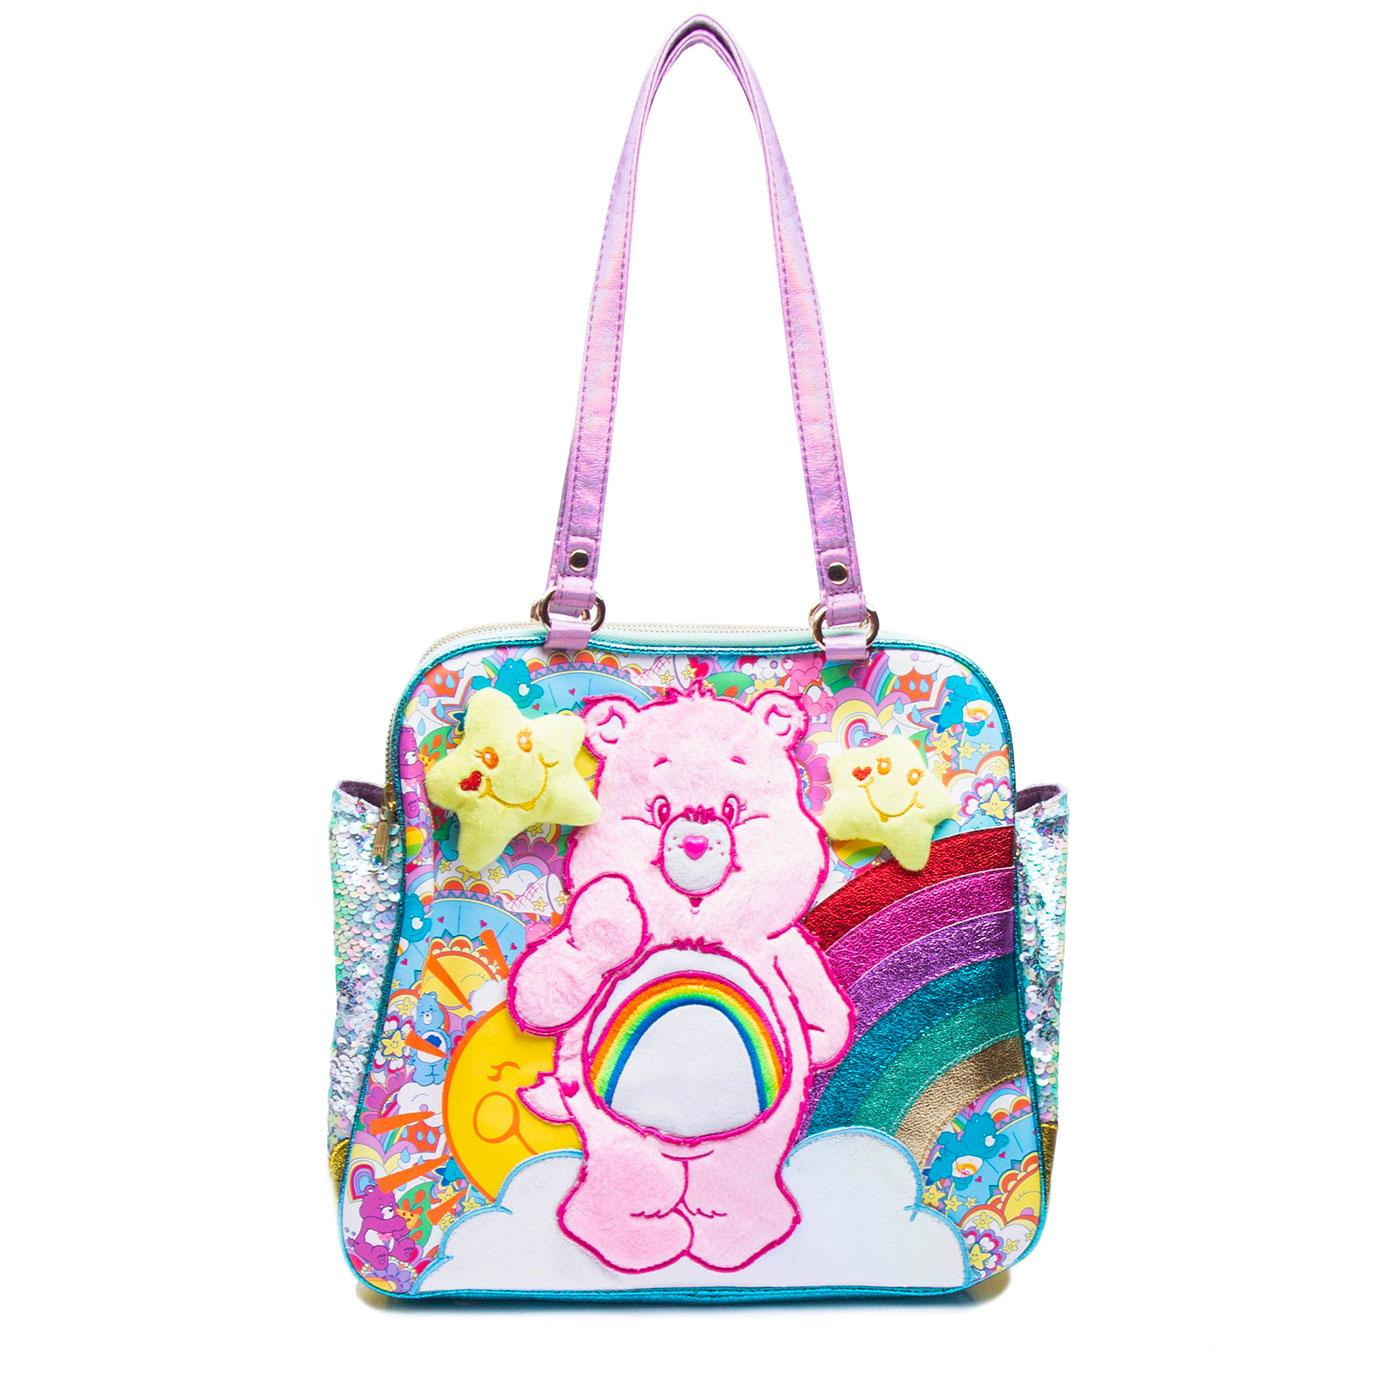 100% Huggable IRREGULAR CHOICE Cheer Bear Handbag